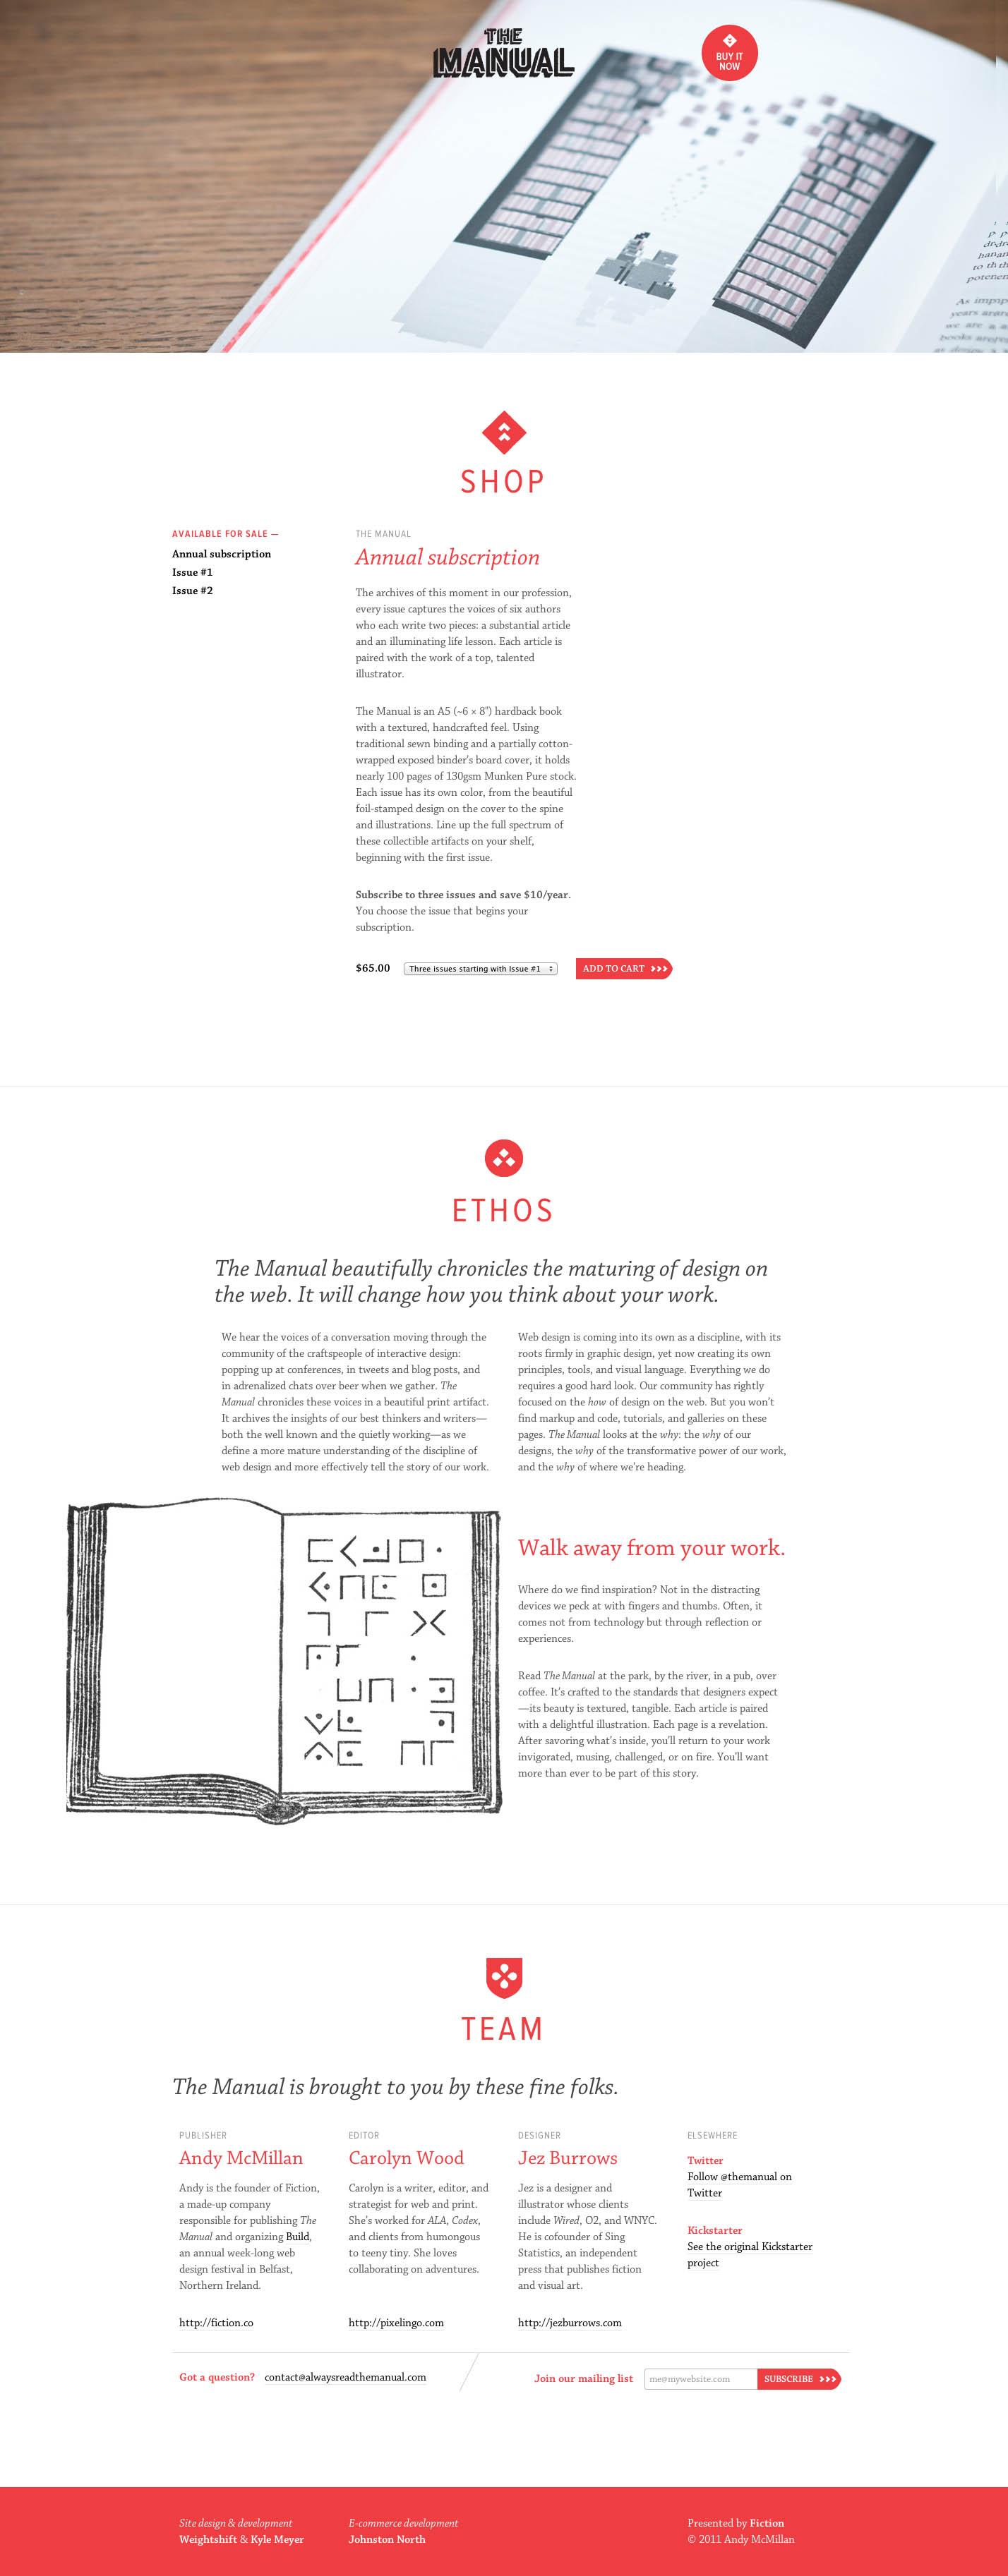 The Manual Website Screenshot